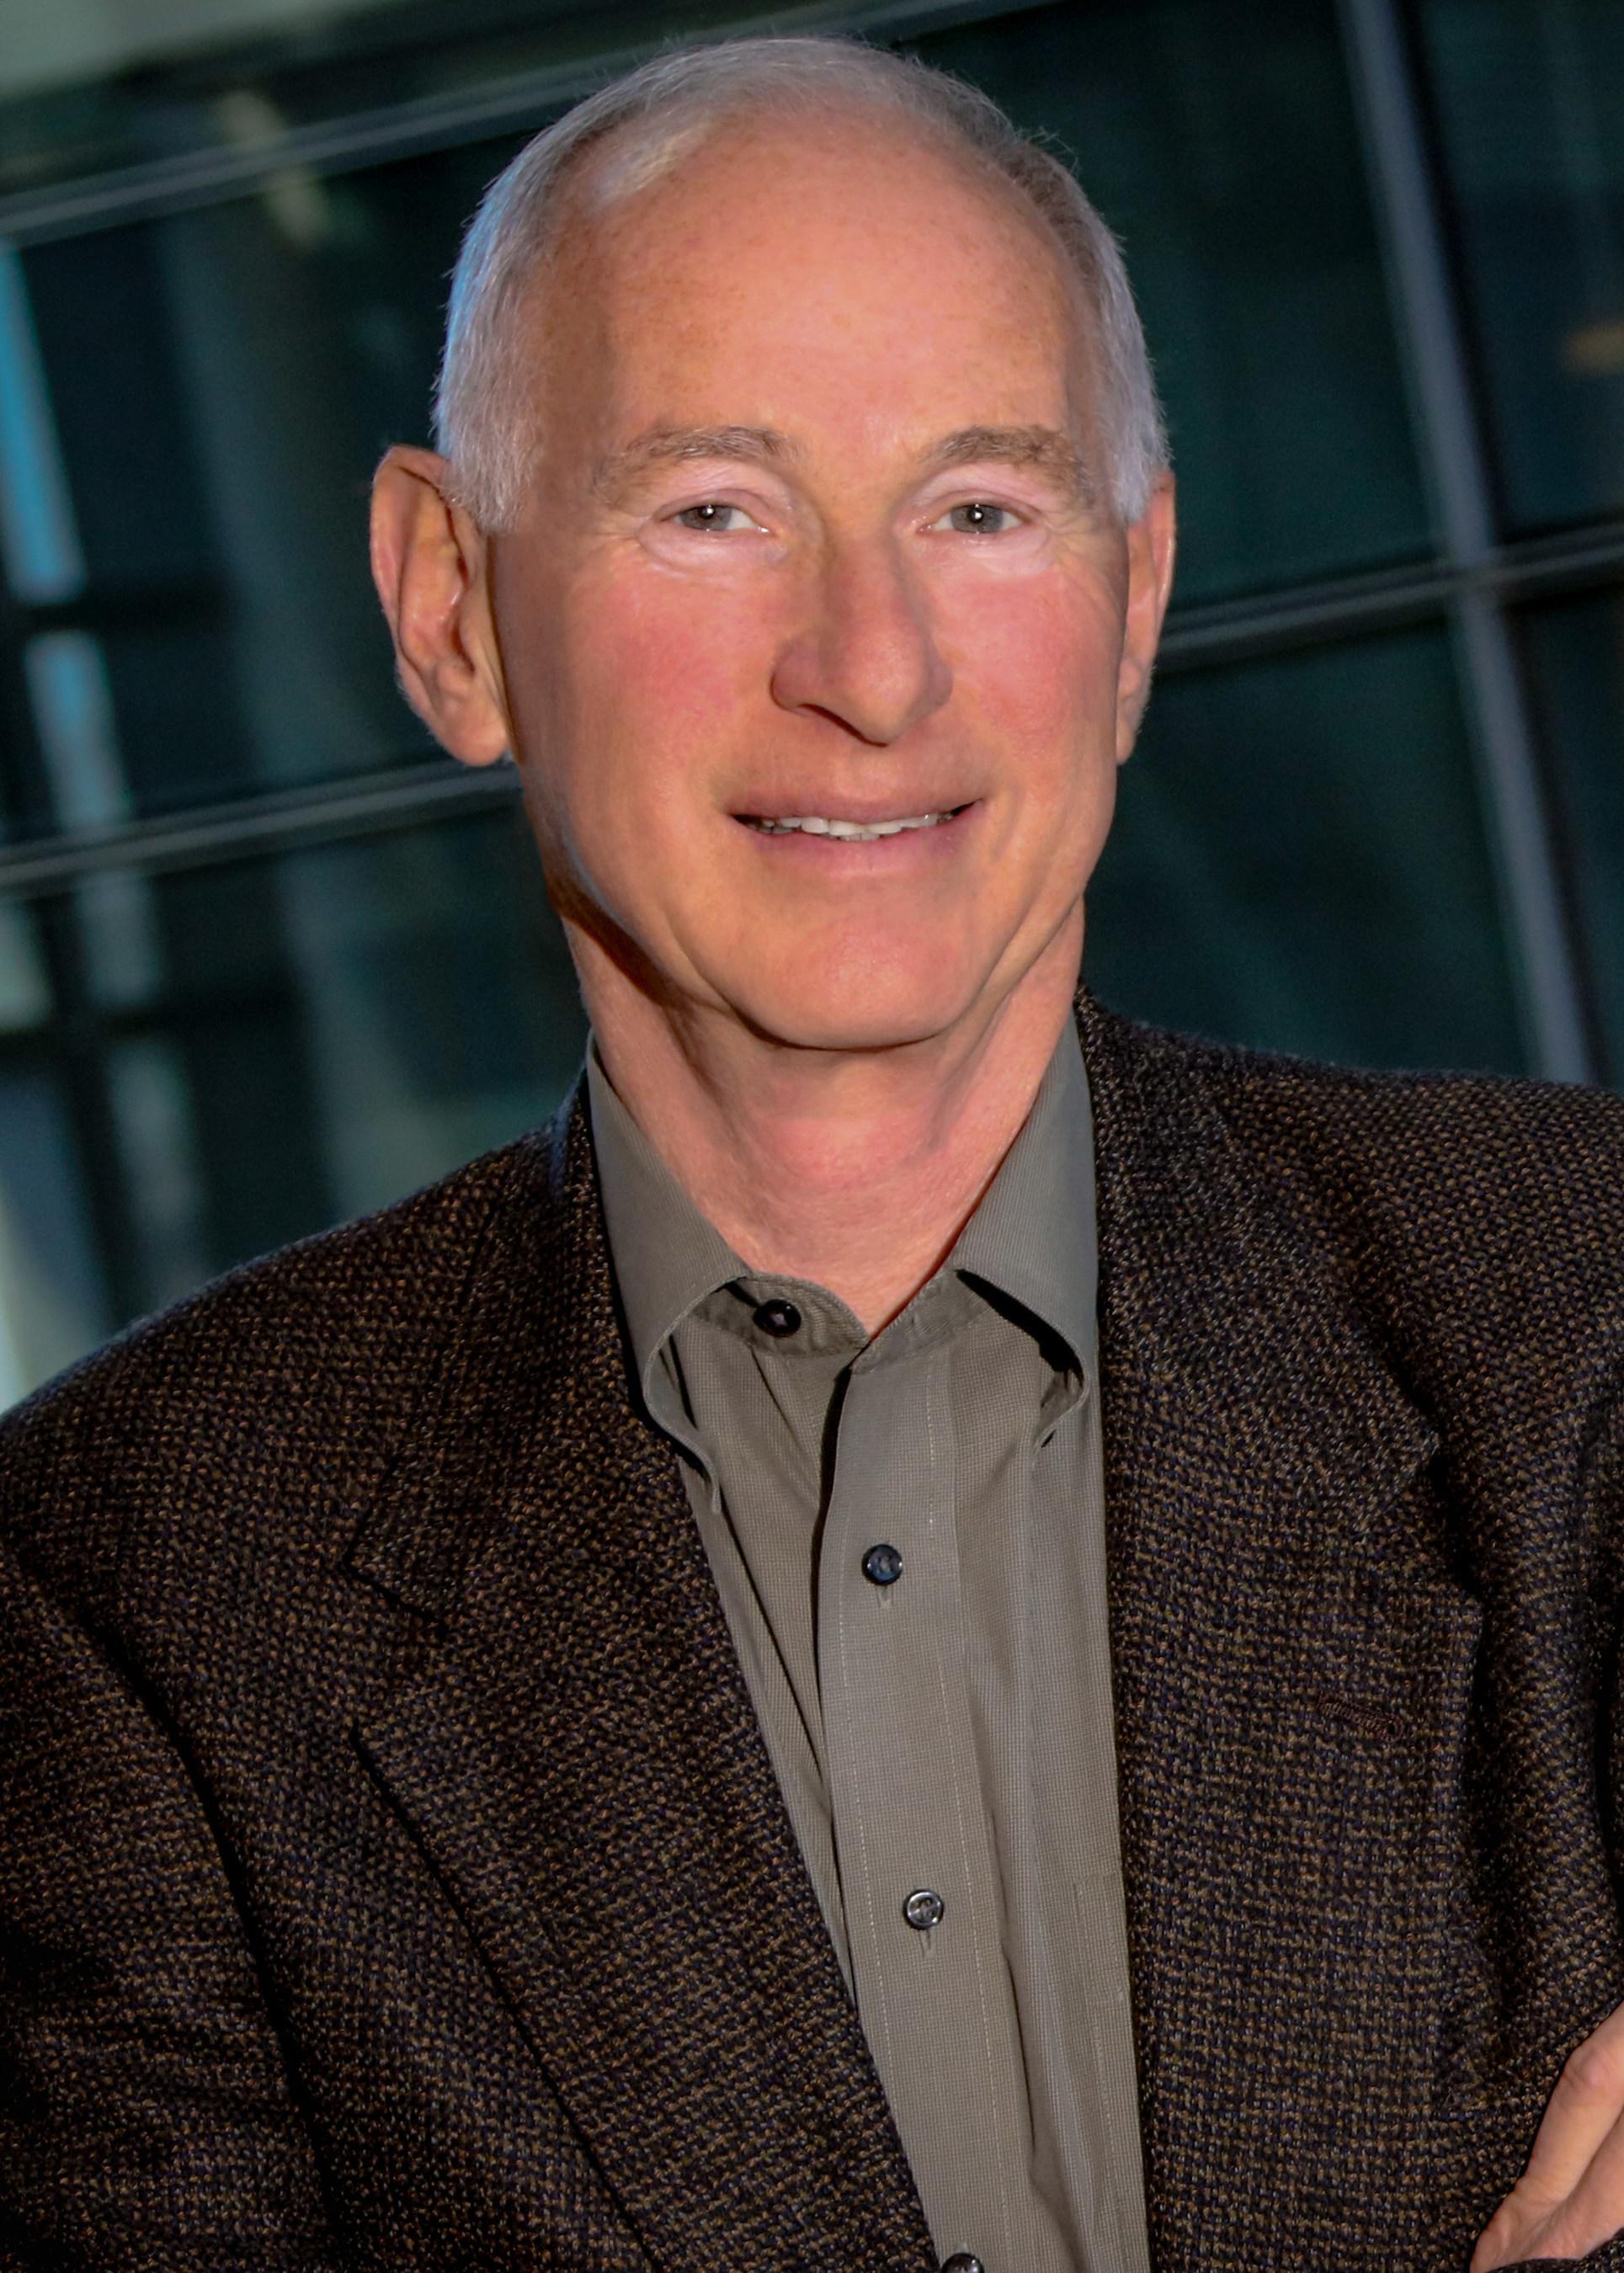 Michael Rosenblatt, M.D., Chief Medical Officer, Flagship Ventures